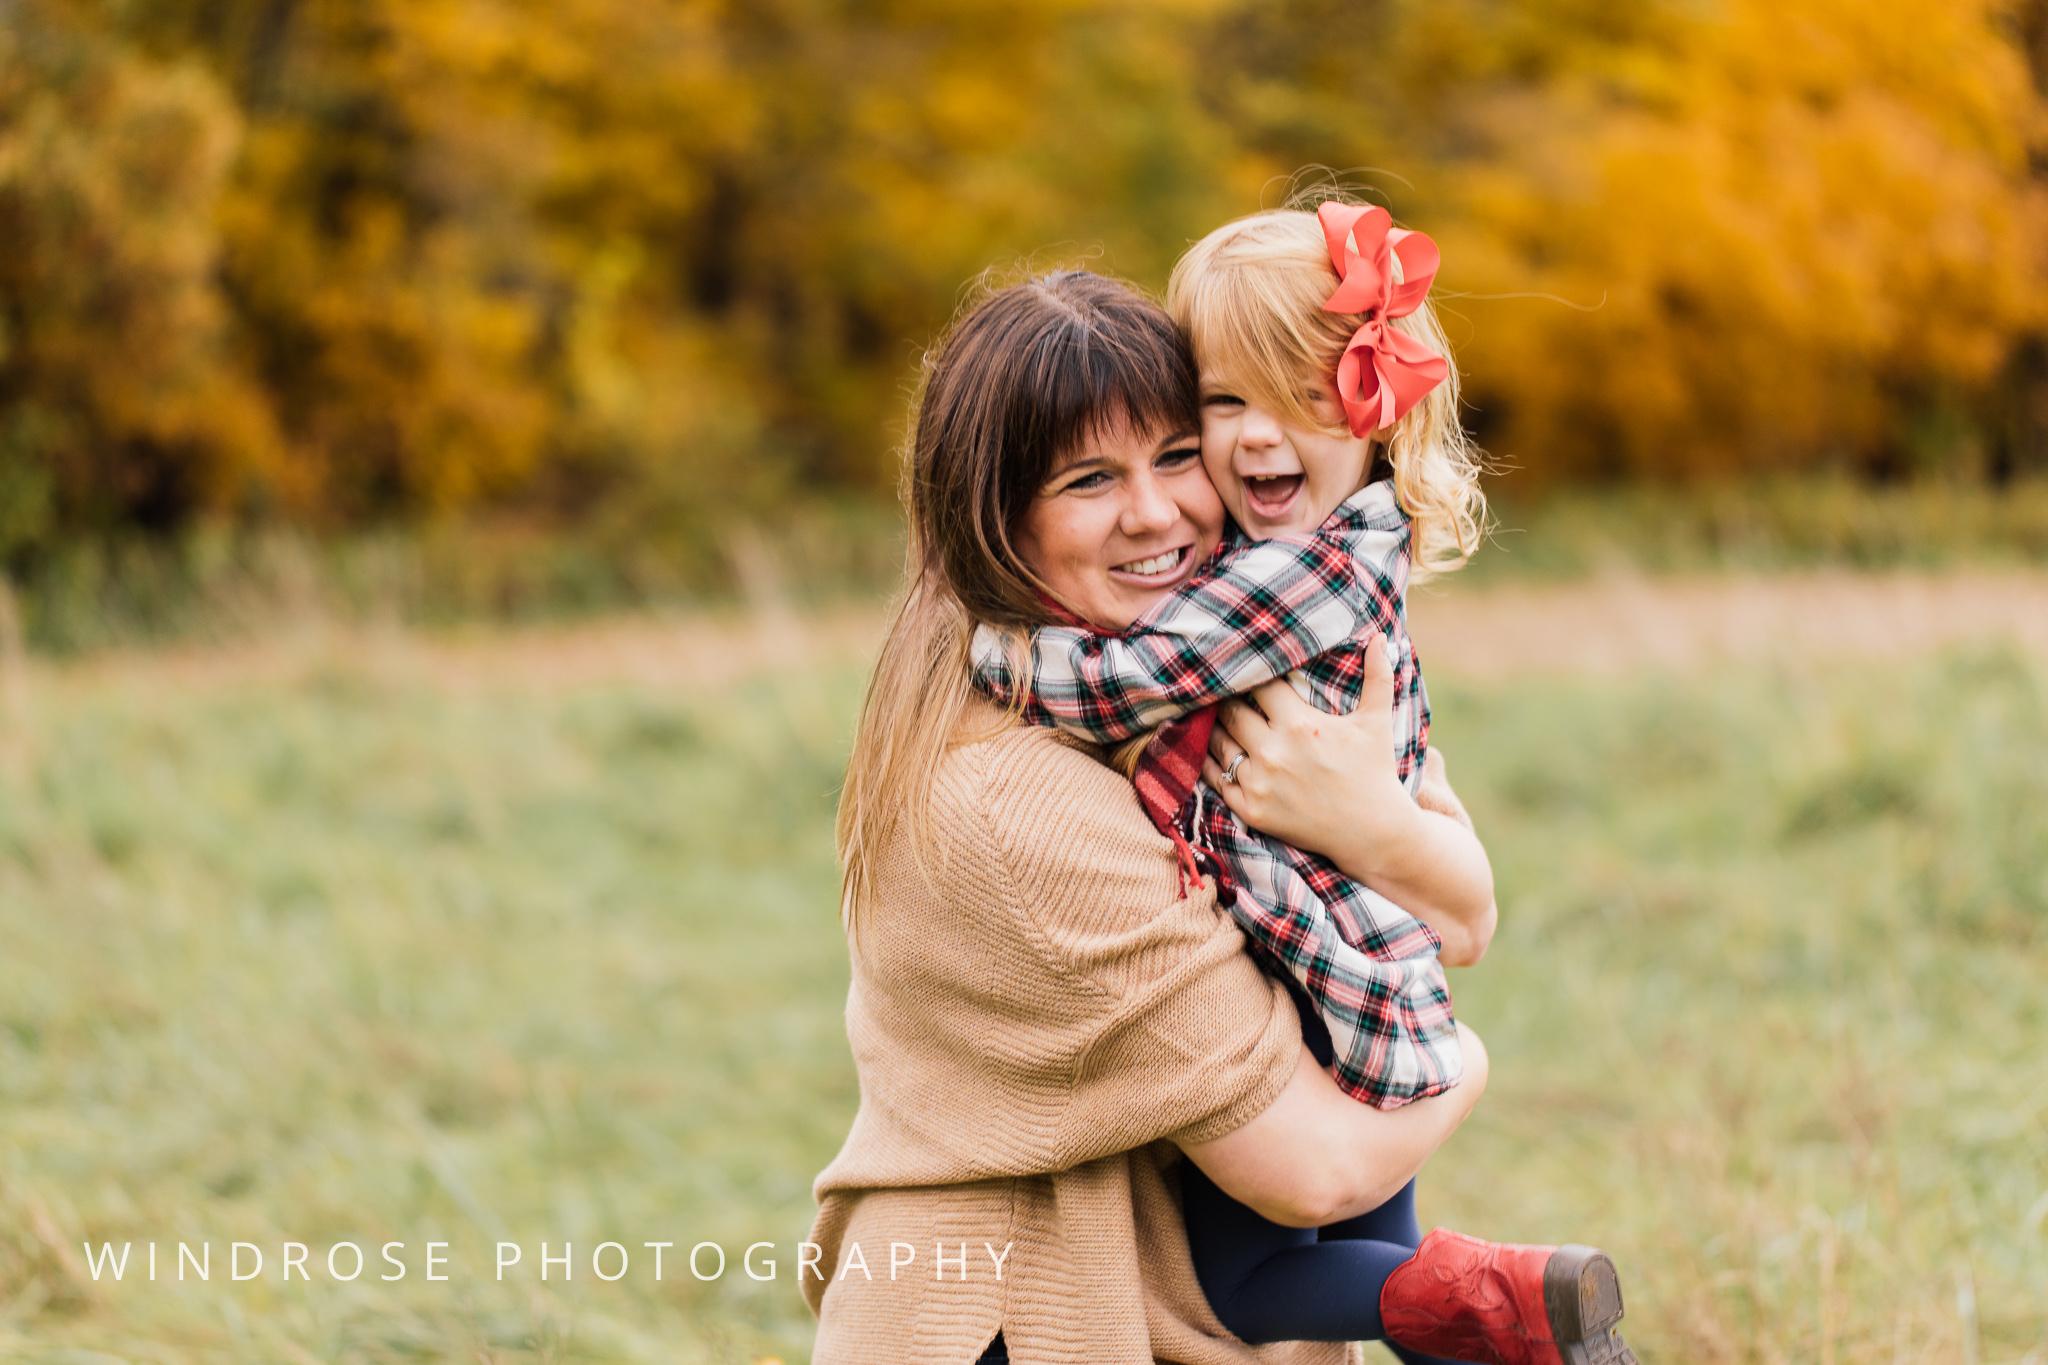 Fall-Family-Portrait-Session-Byron-MN-10.jpg